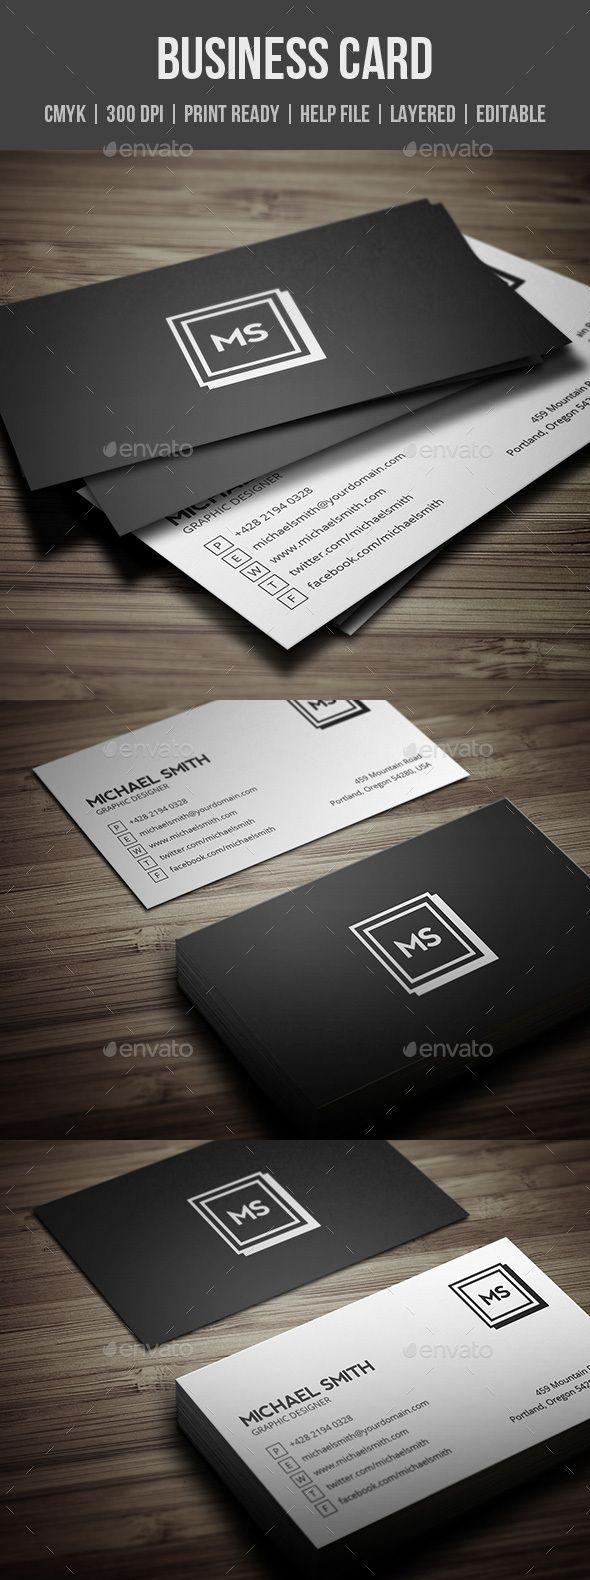 21 Best Business Cards Images On Pinterest Business Card Design